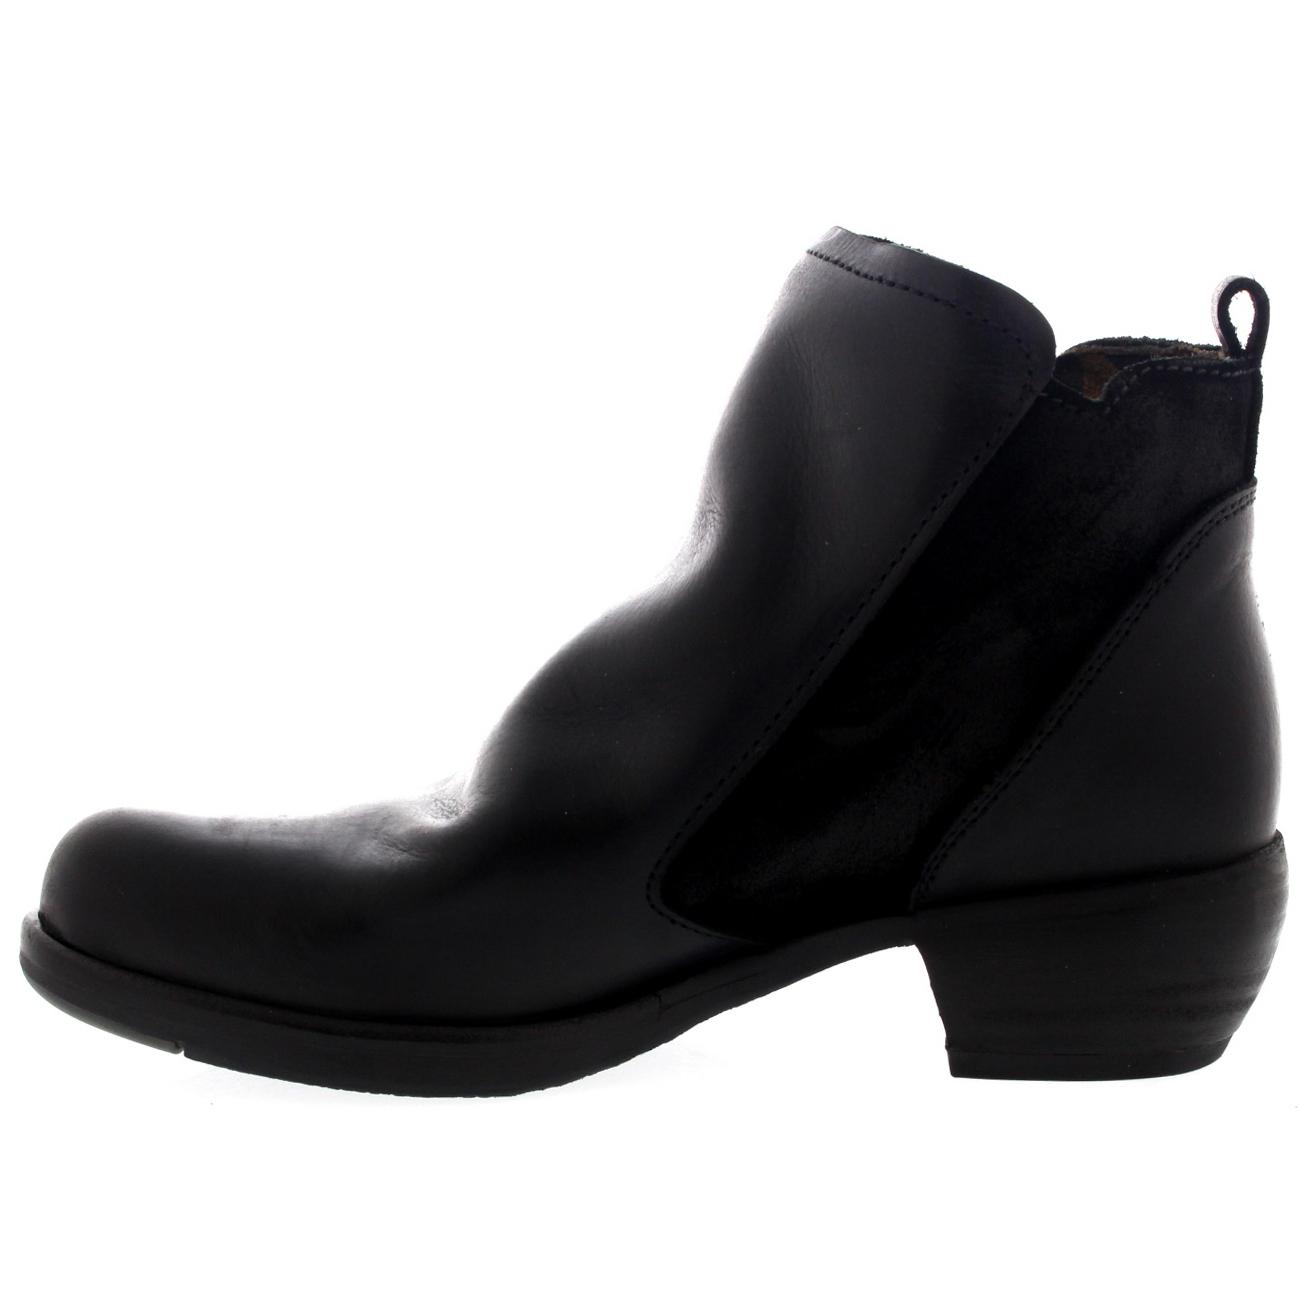 Womens Fly London Meli Rug Leather Cowboy Low Heel Western Ankle ...